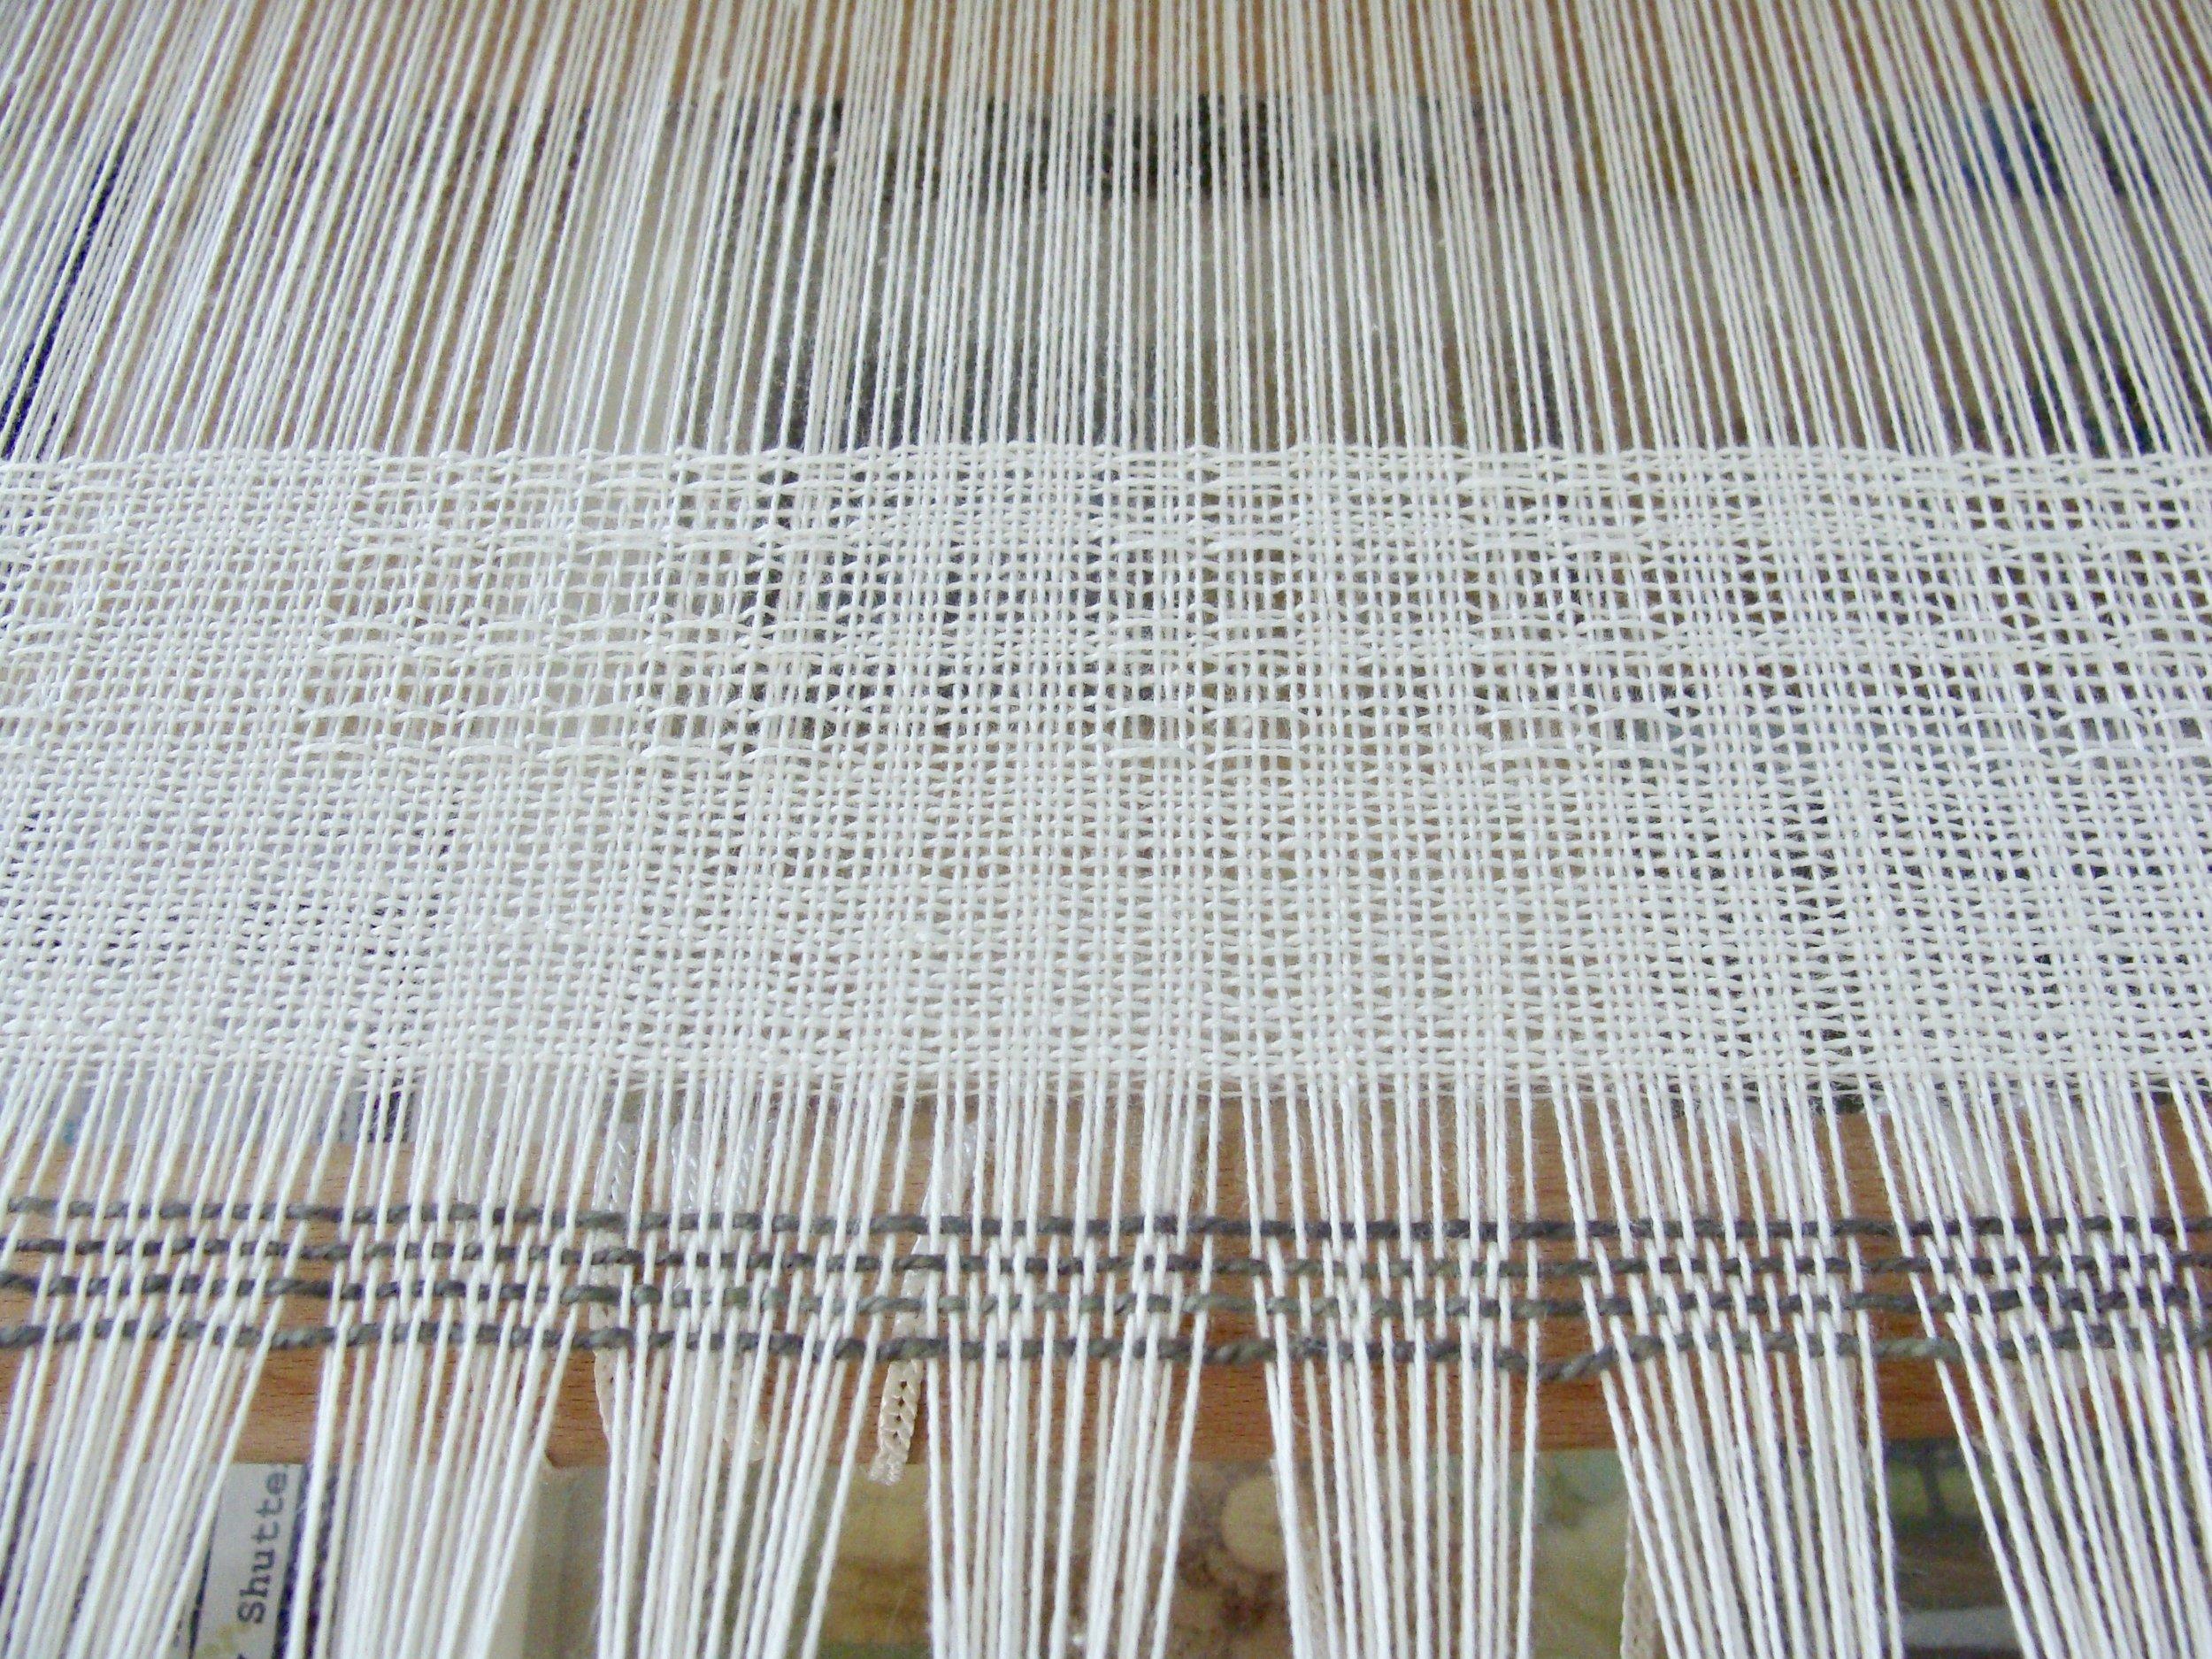 weaving Swedish Lace towels on Jane loom